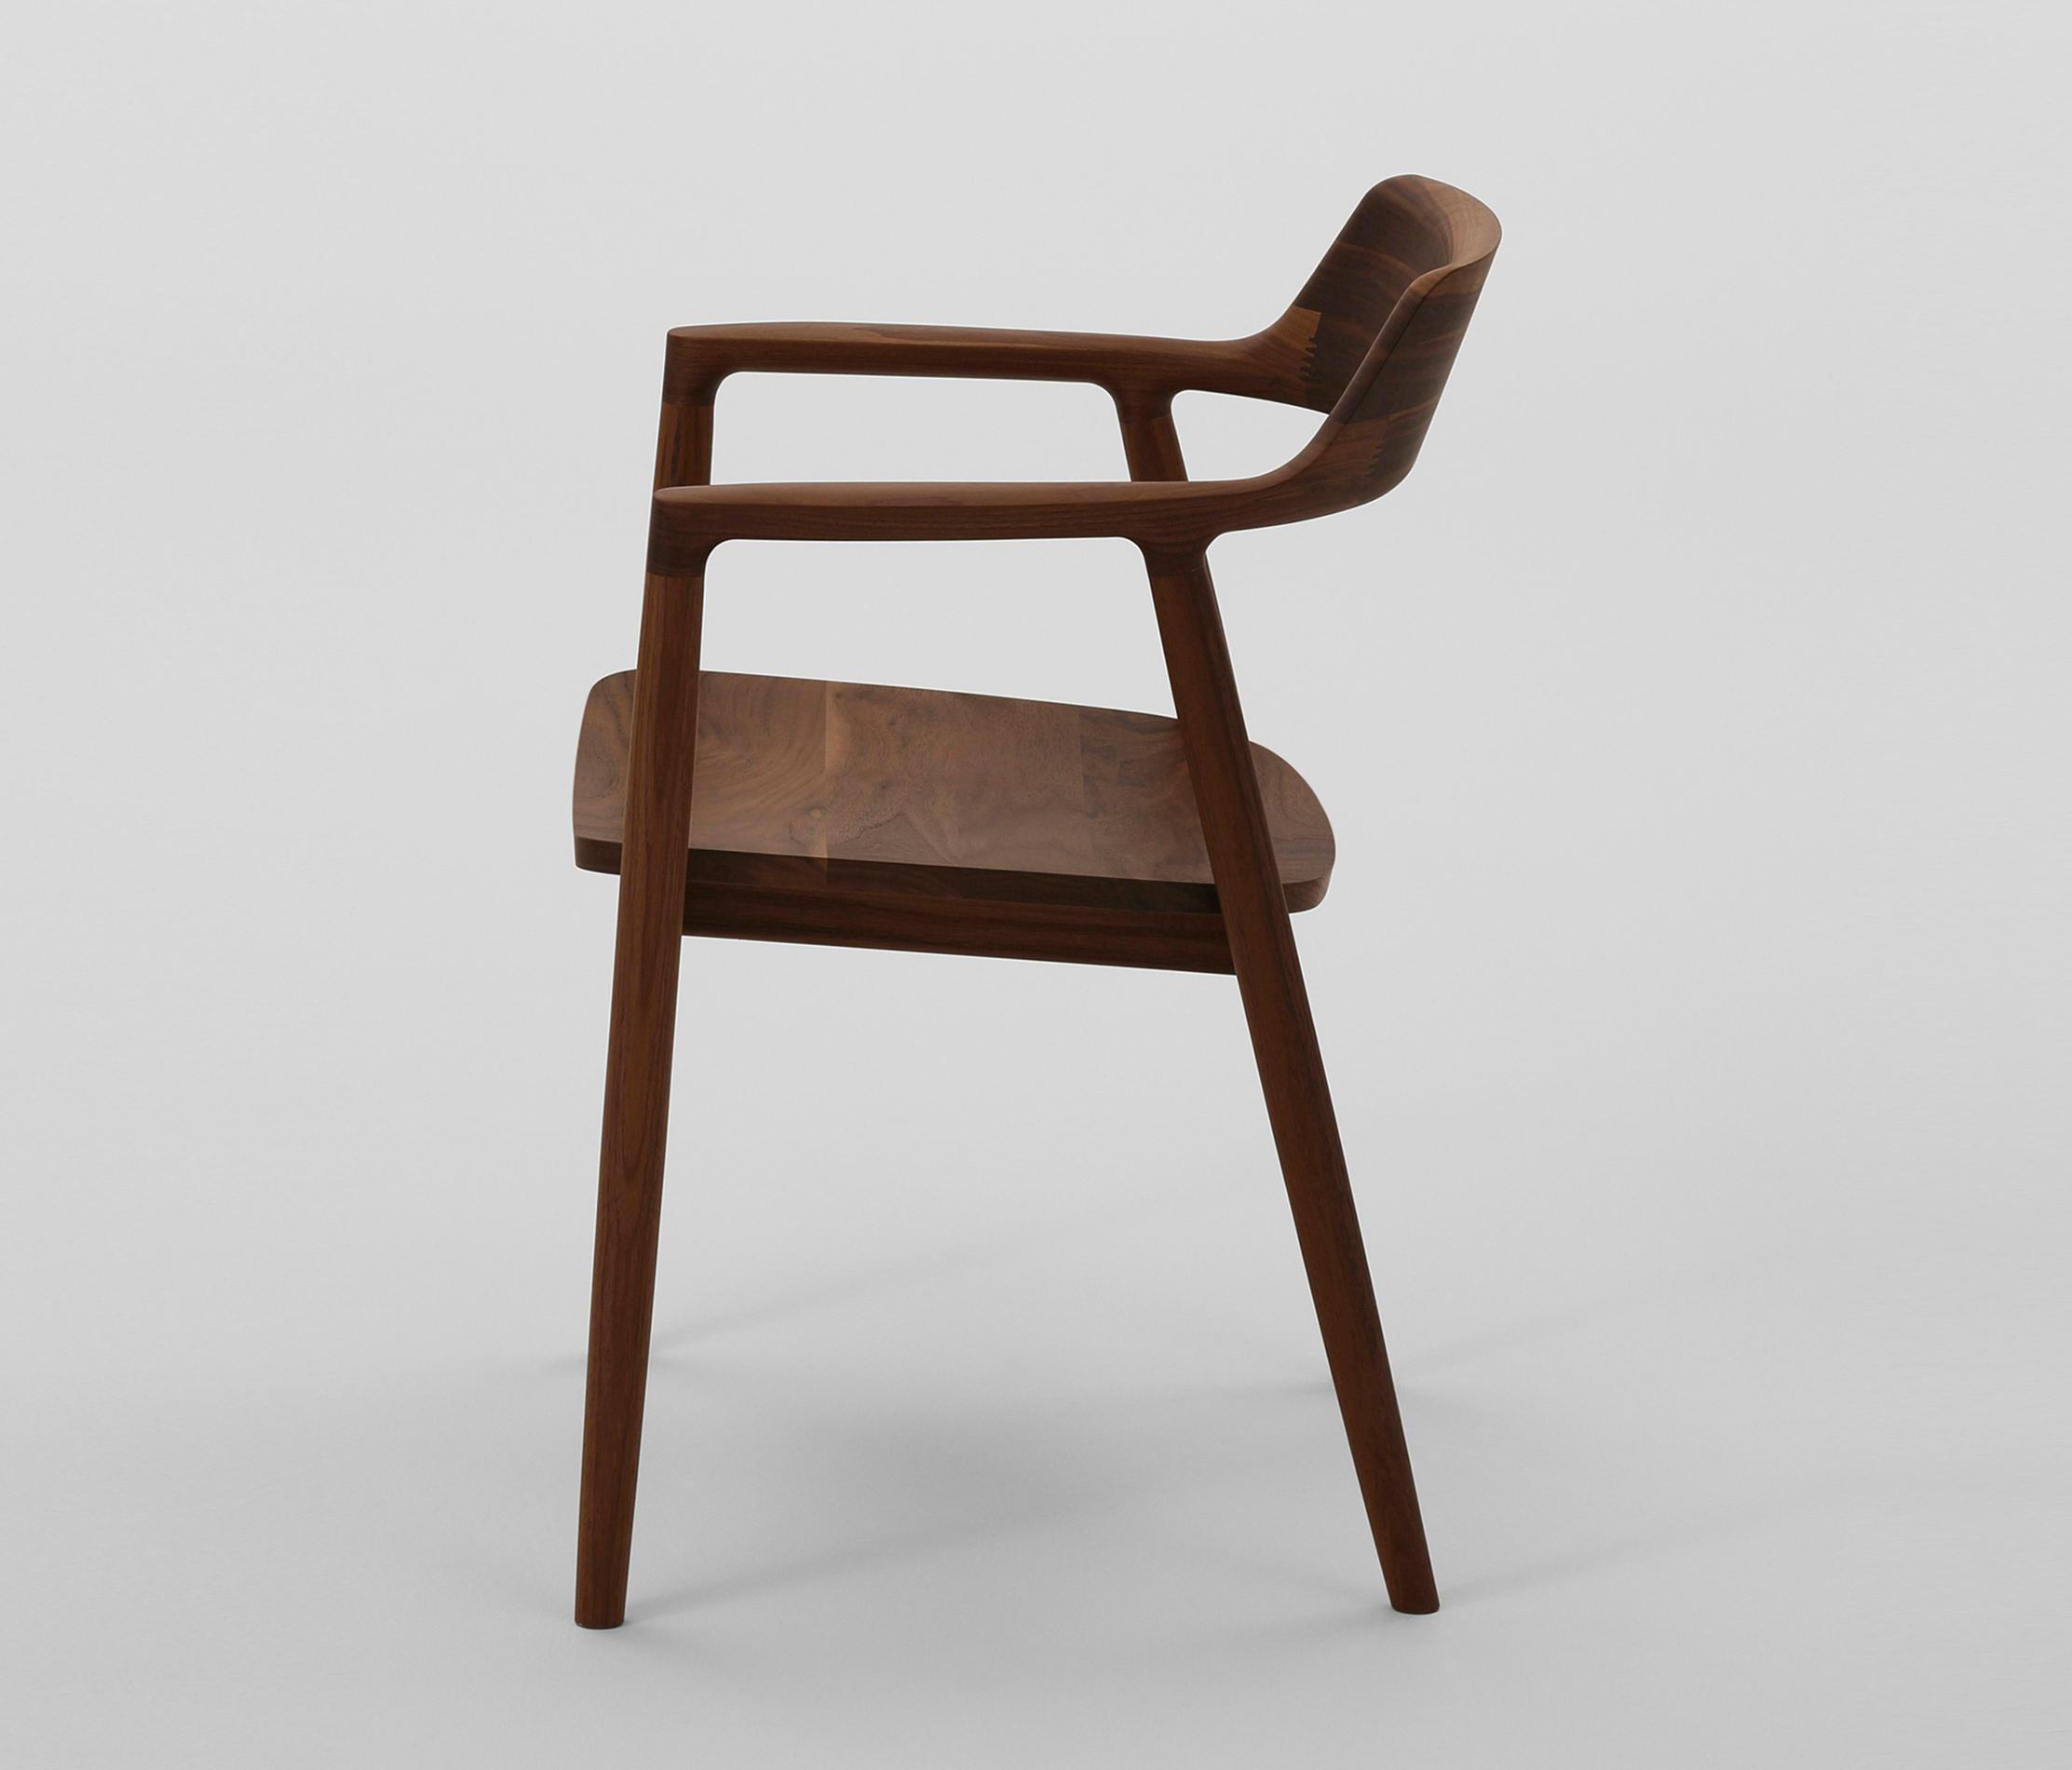 Asian Wood Arm Chairs ~ Hiroshima arm chair high wooden seat restaurant chairs